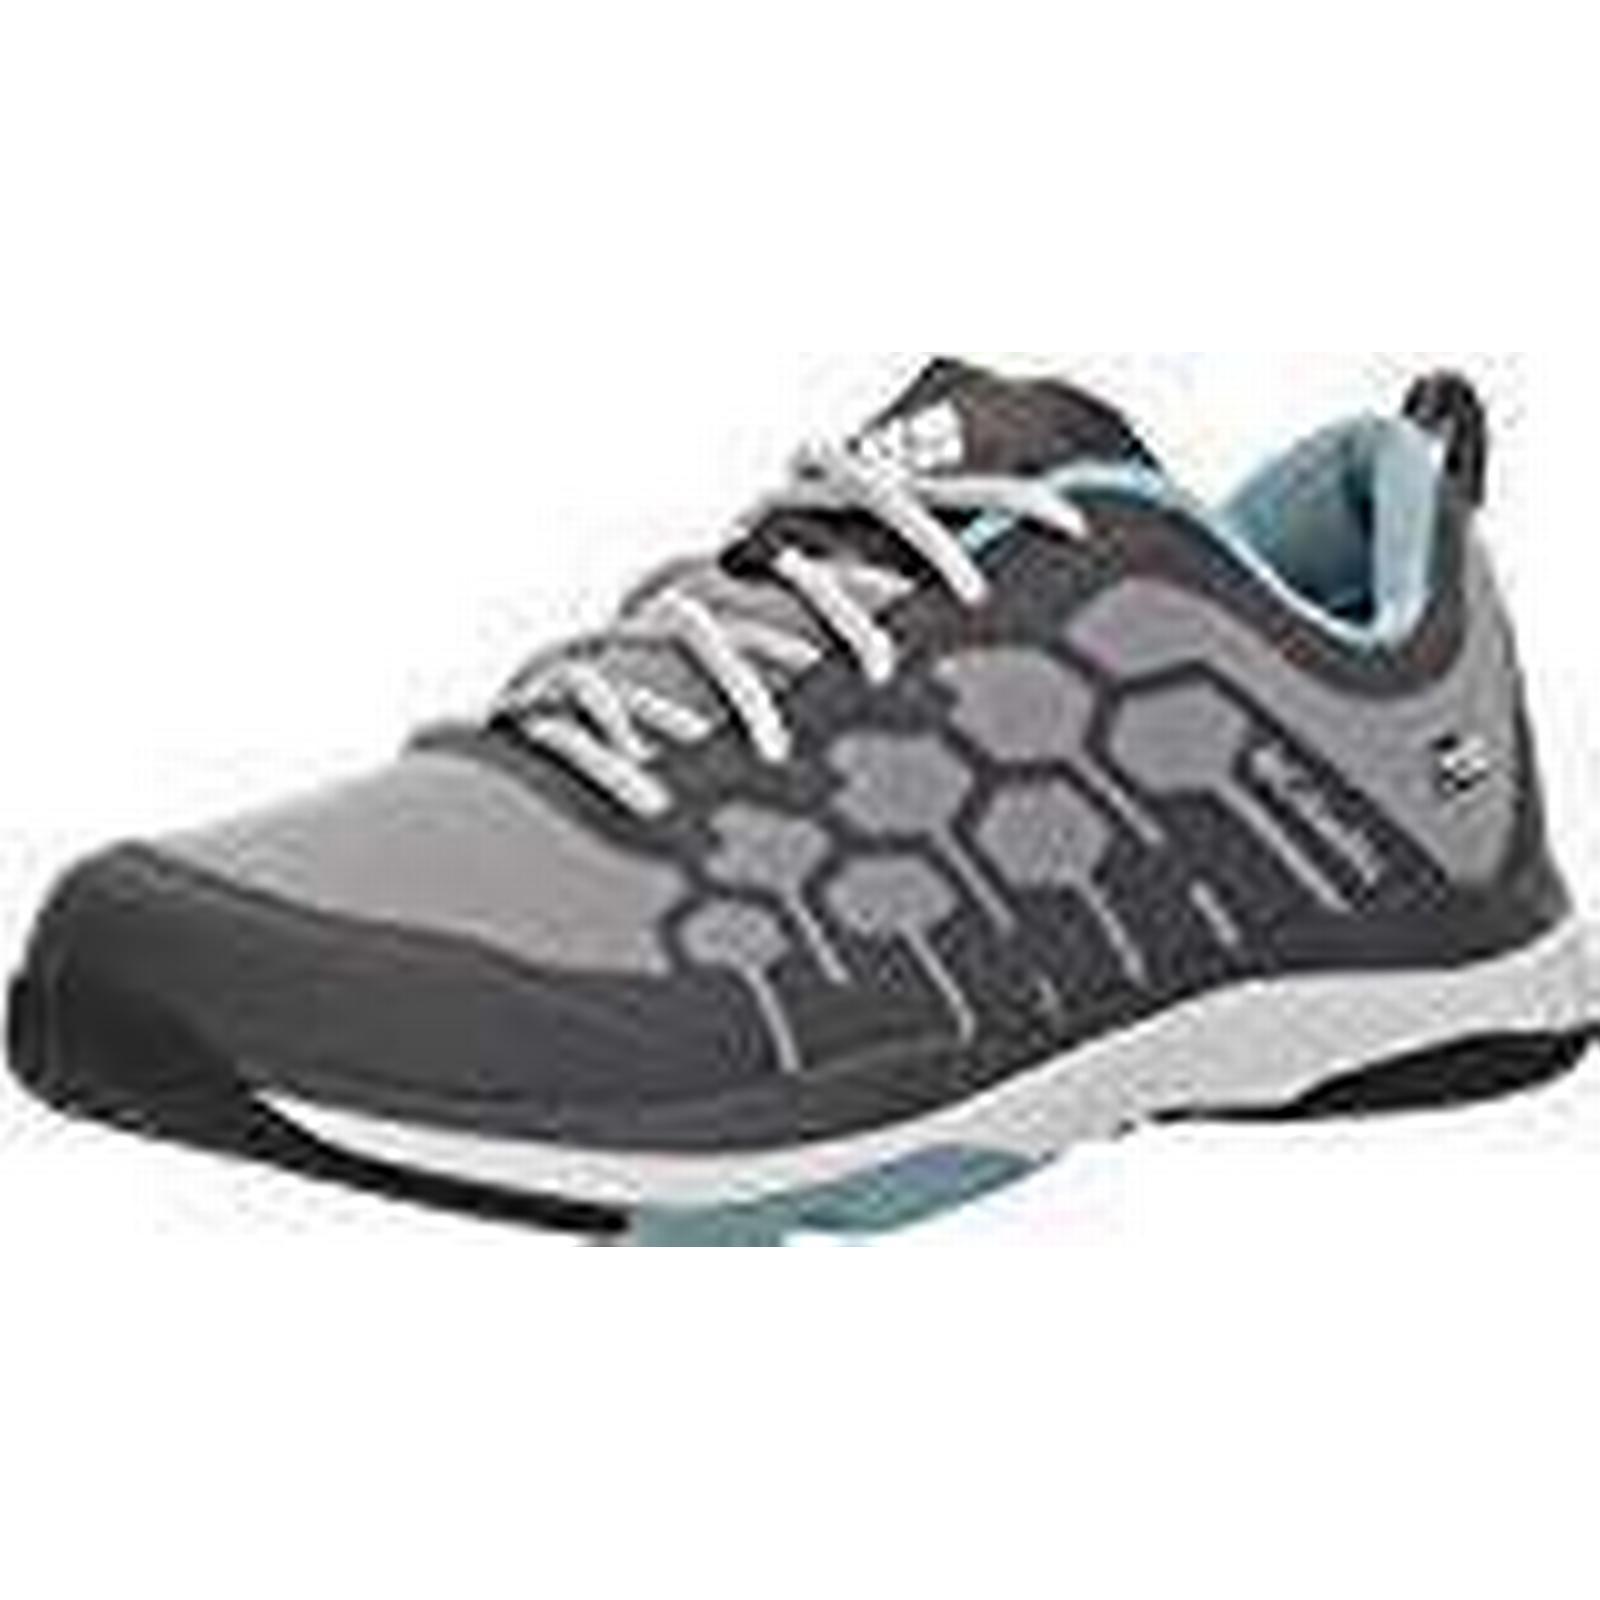 Columbia Women's ATS Trail Fs38 Outdry Multisport Outdoor 5.5 Shoes (Ti Grey Steel/Storm), 5.5 Outdoor UK 38.5 EU 7fb5cf